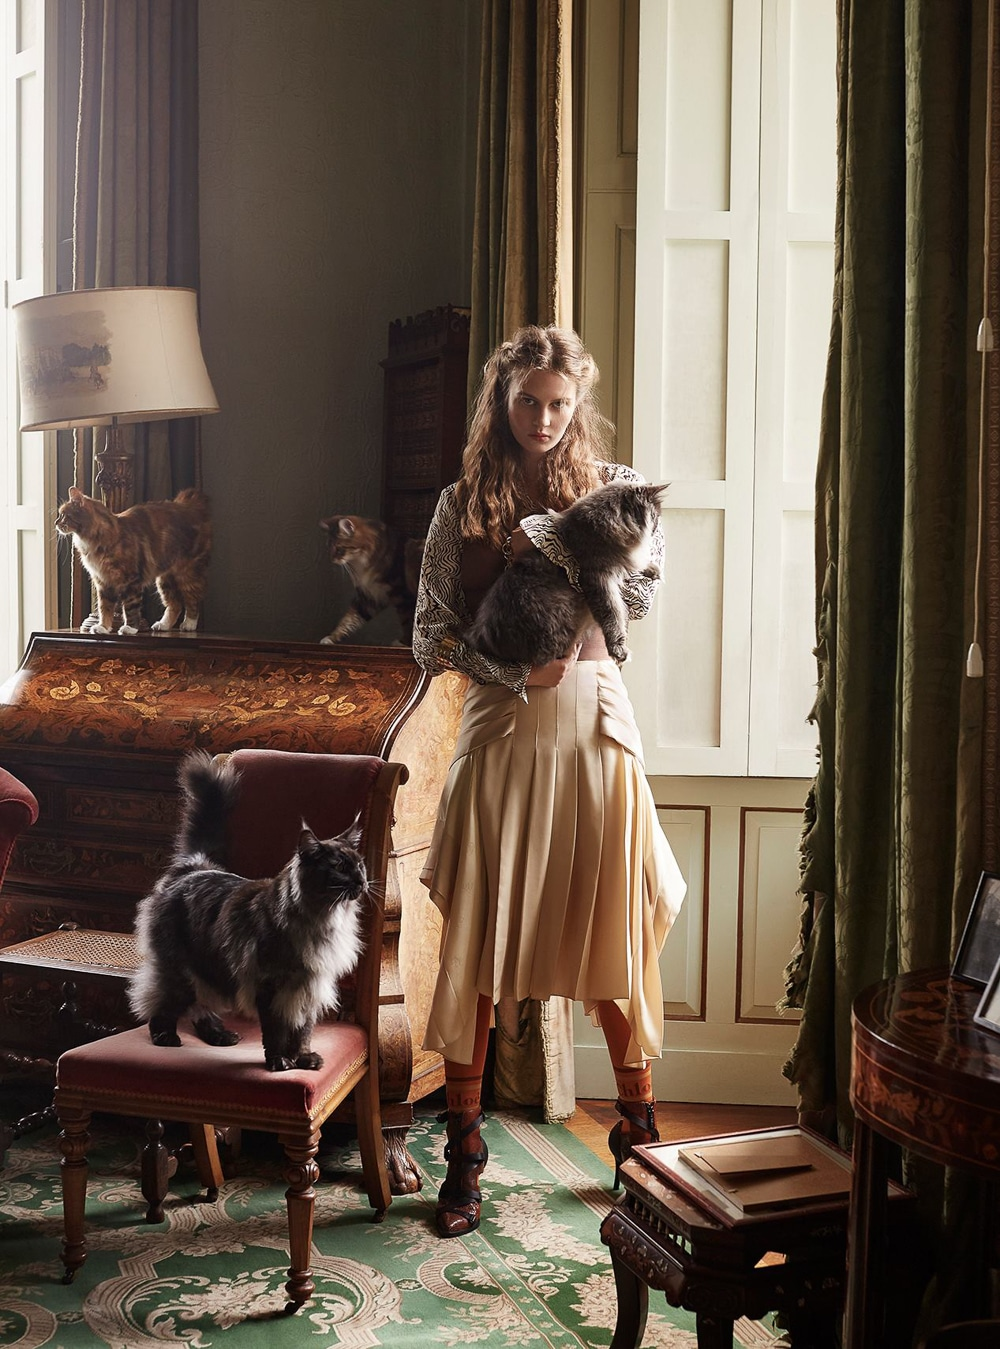 Harpers-Bazaar-UK-Septamber-2018-Florence-Kosky-Agata-Pospieszynska-3.jpg